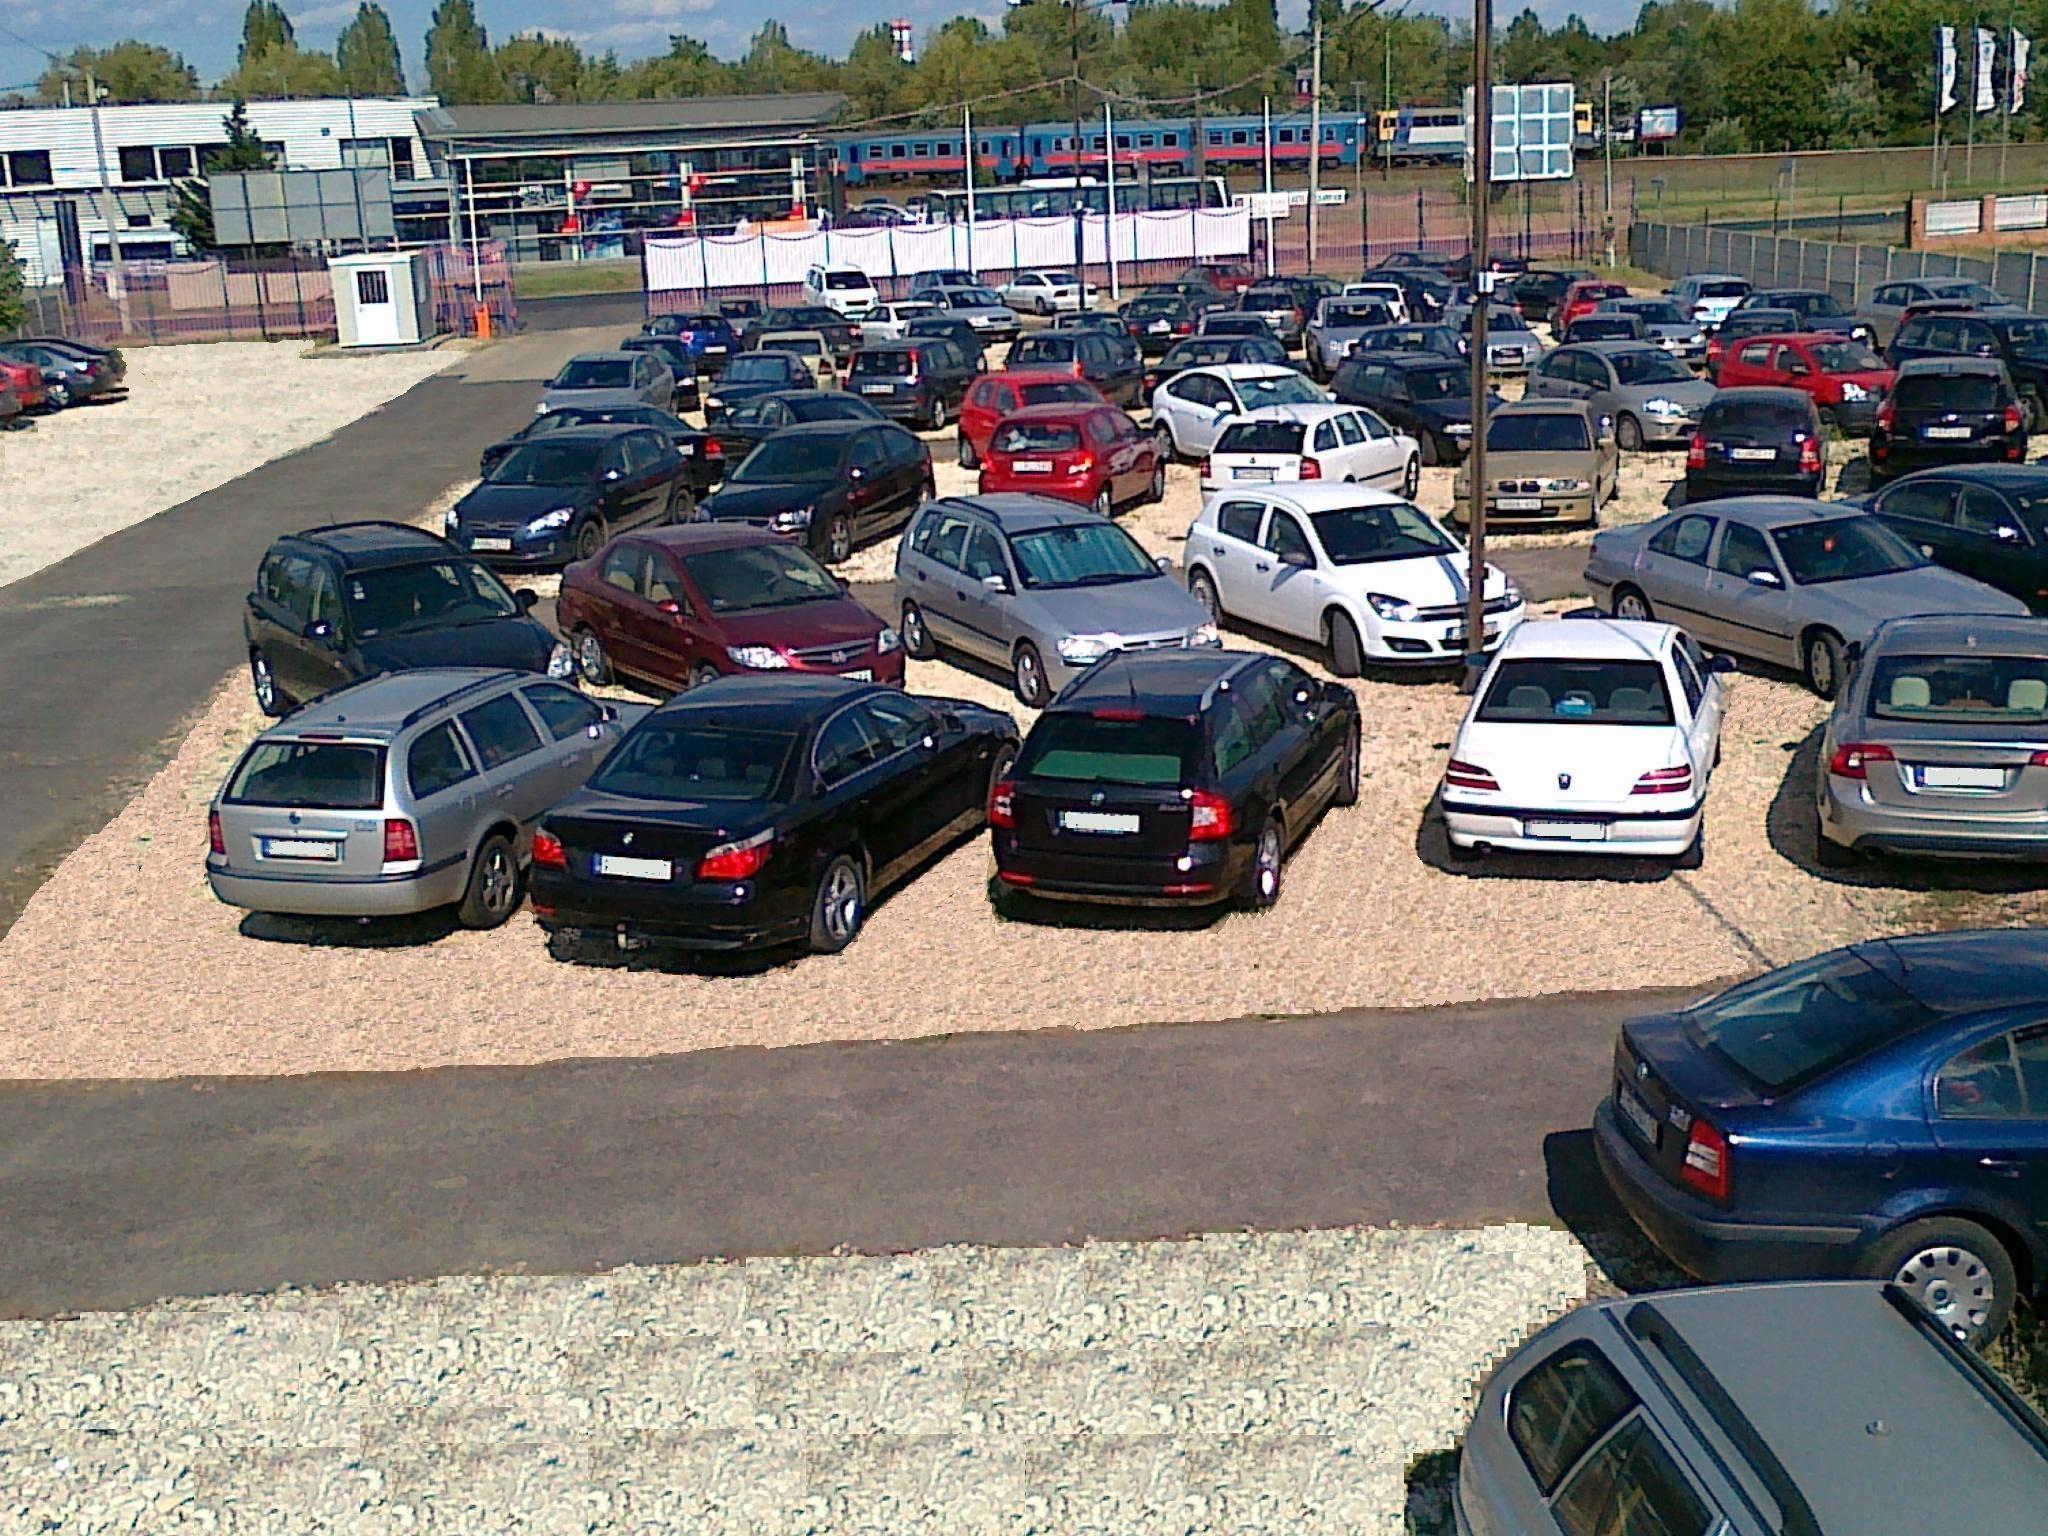 https://direct.parkcloud.com/images/operator/00000000-0000-0000-0000-000000000000/2265